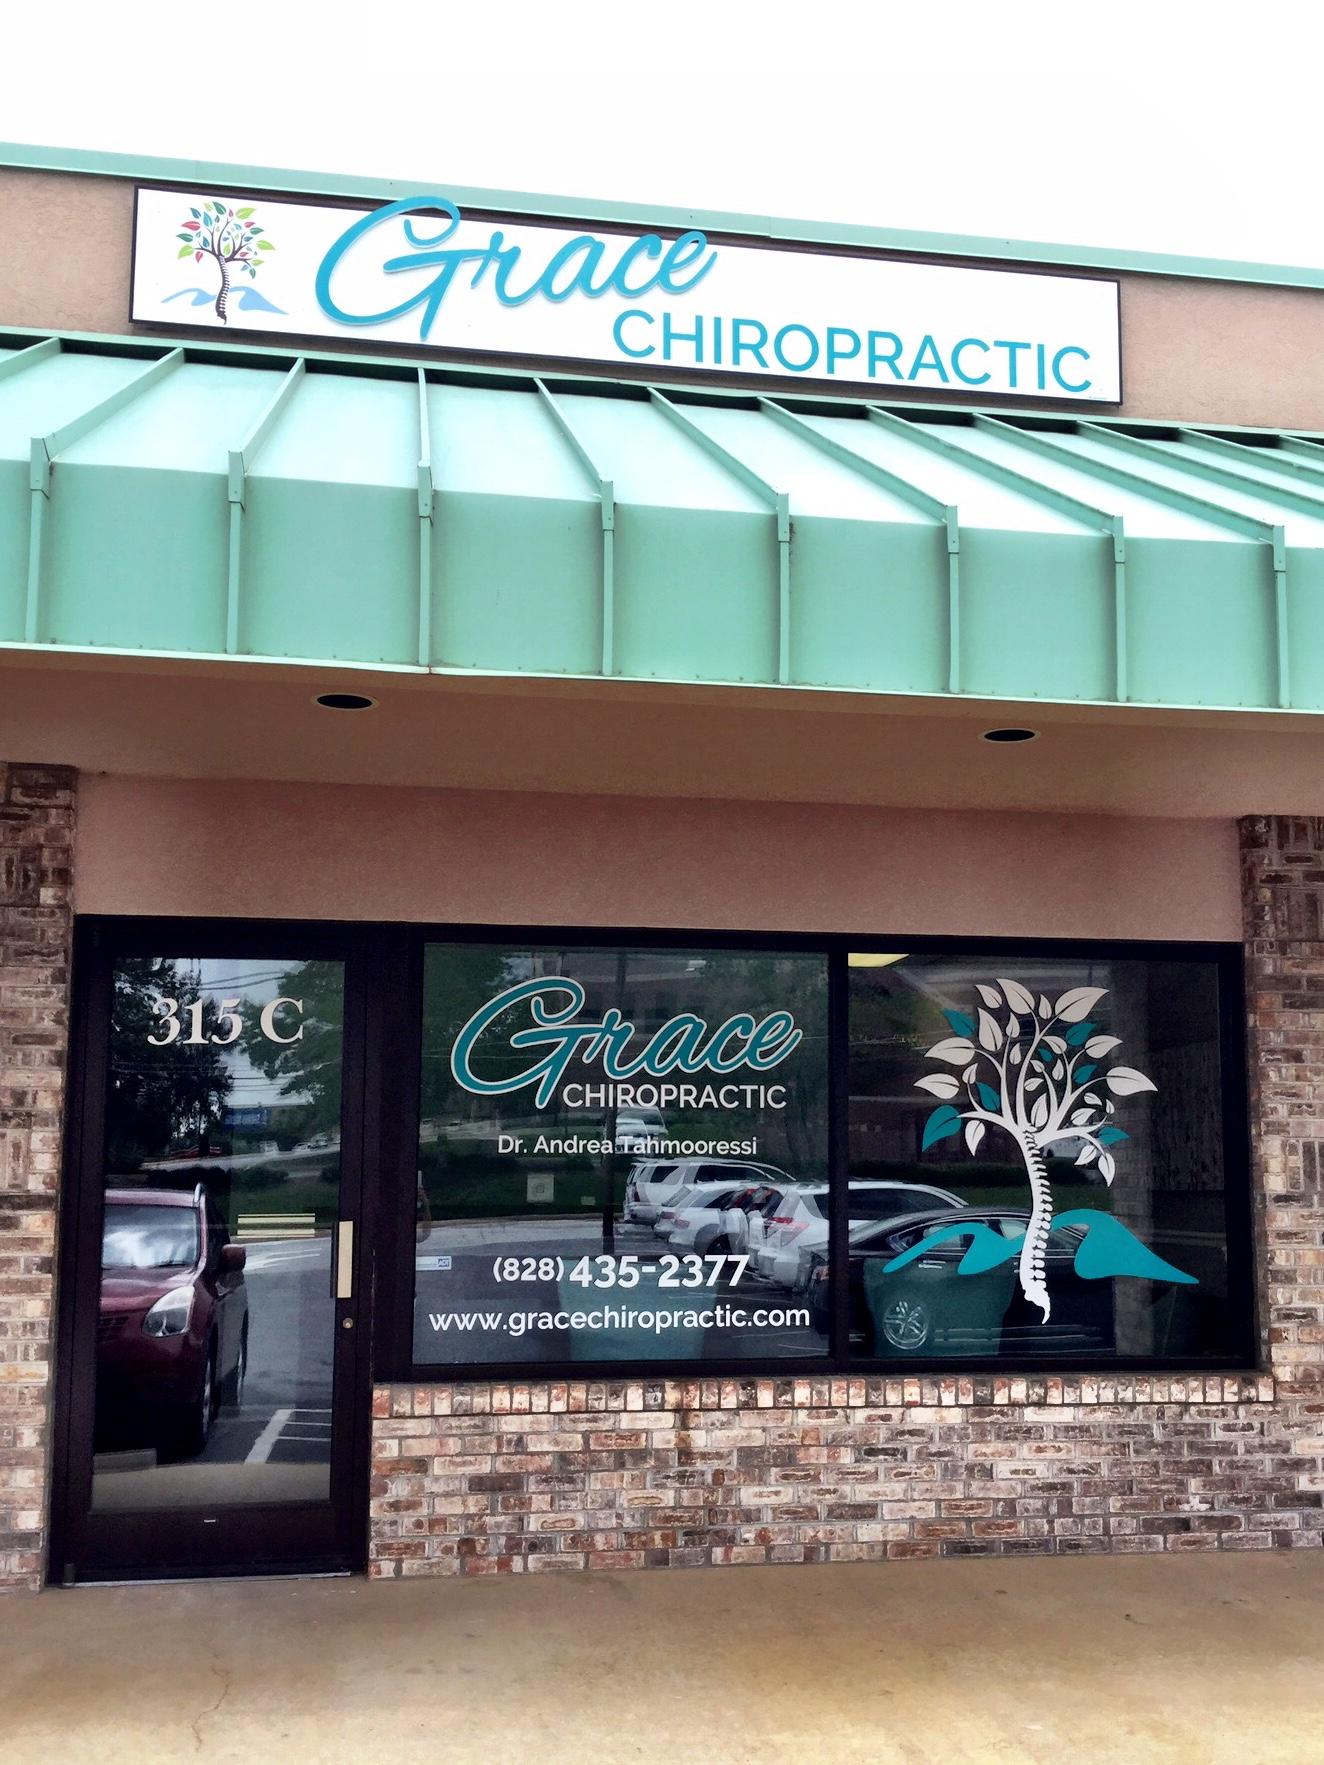 Grace-Chiropractic-Arden-Office-Photos-9.JPG